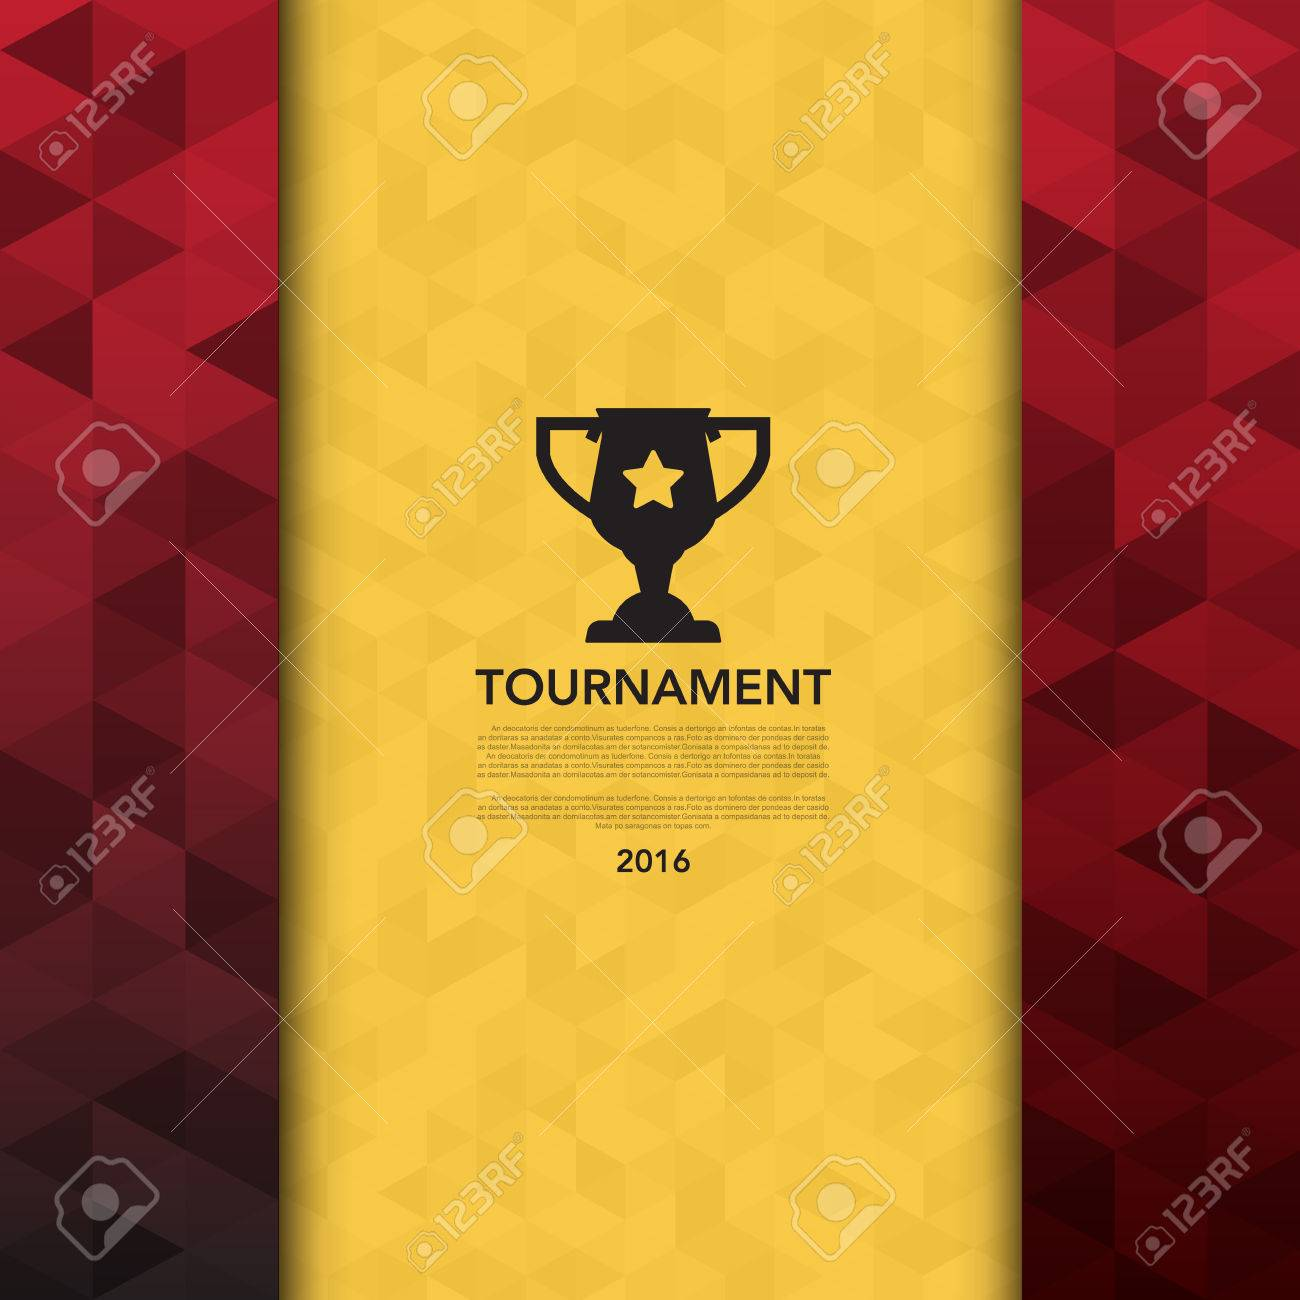 Soccer ( football ) tournament background - 58179664